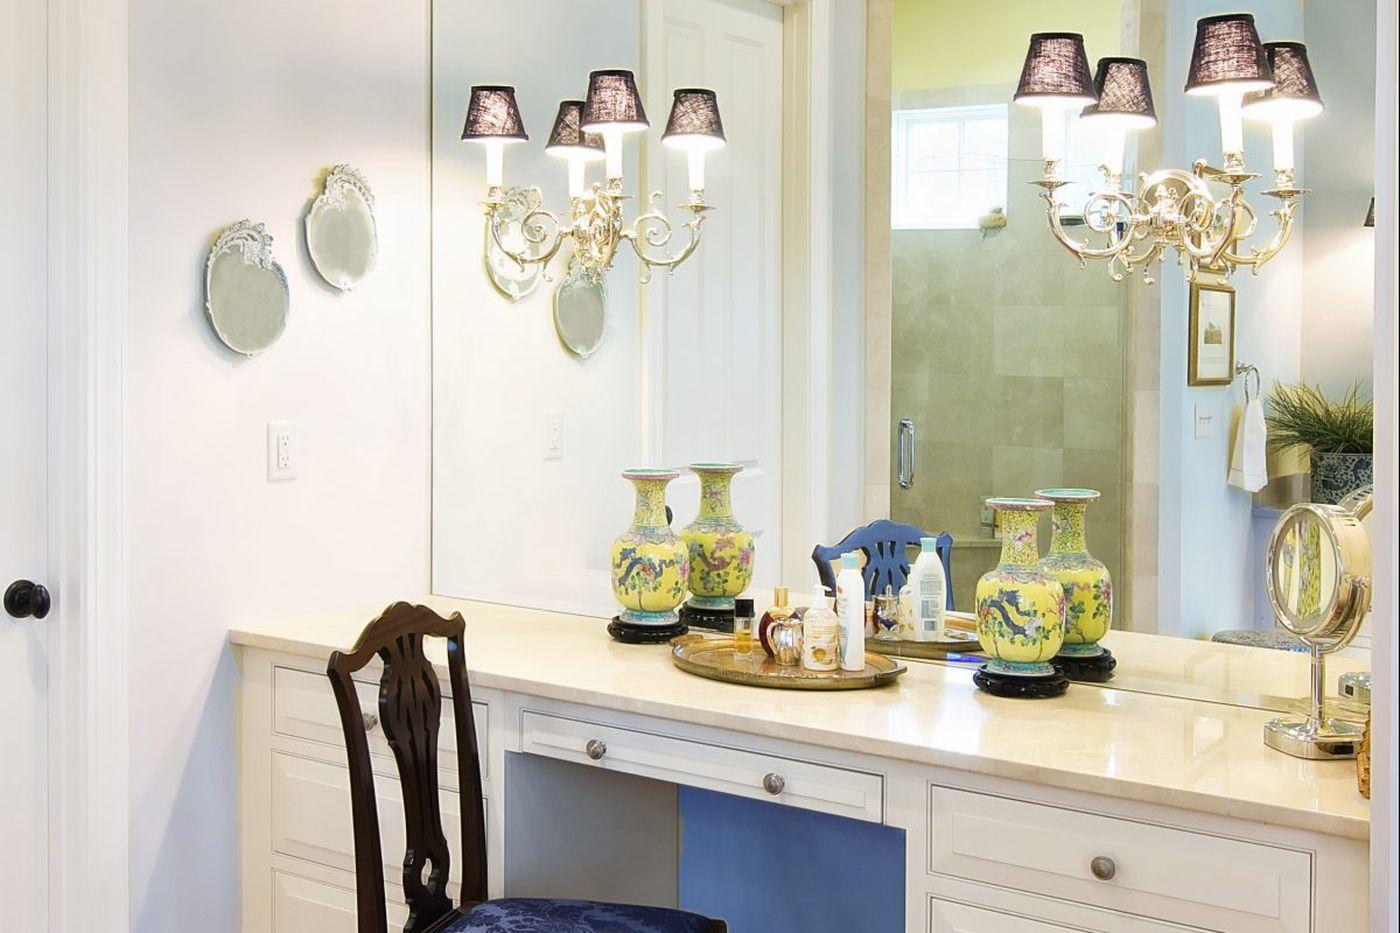 Ask Jennifer Adams: What's the best lighting for your bathroom vanity?